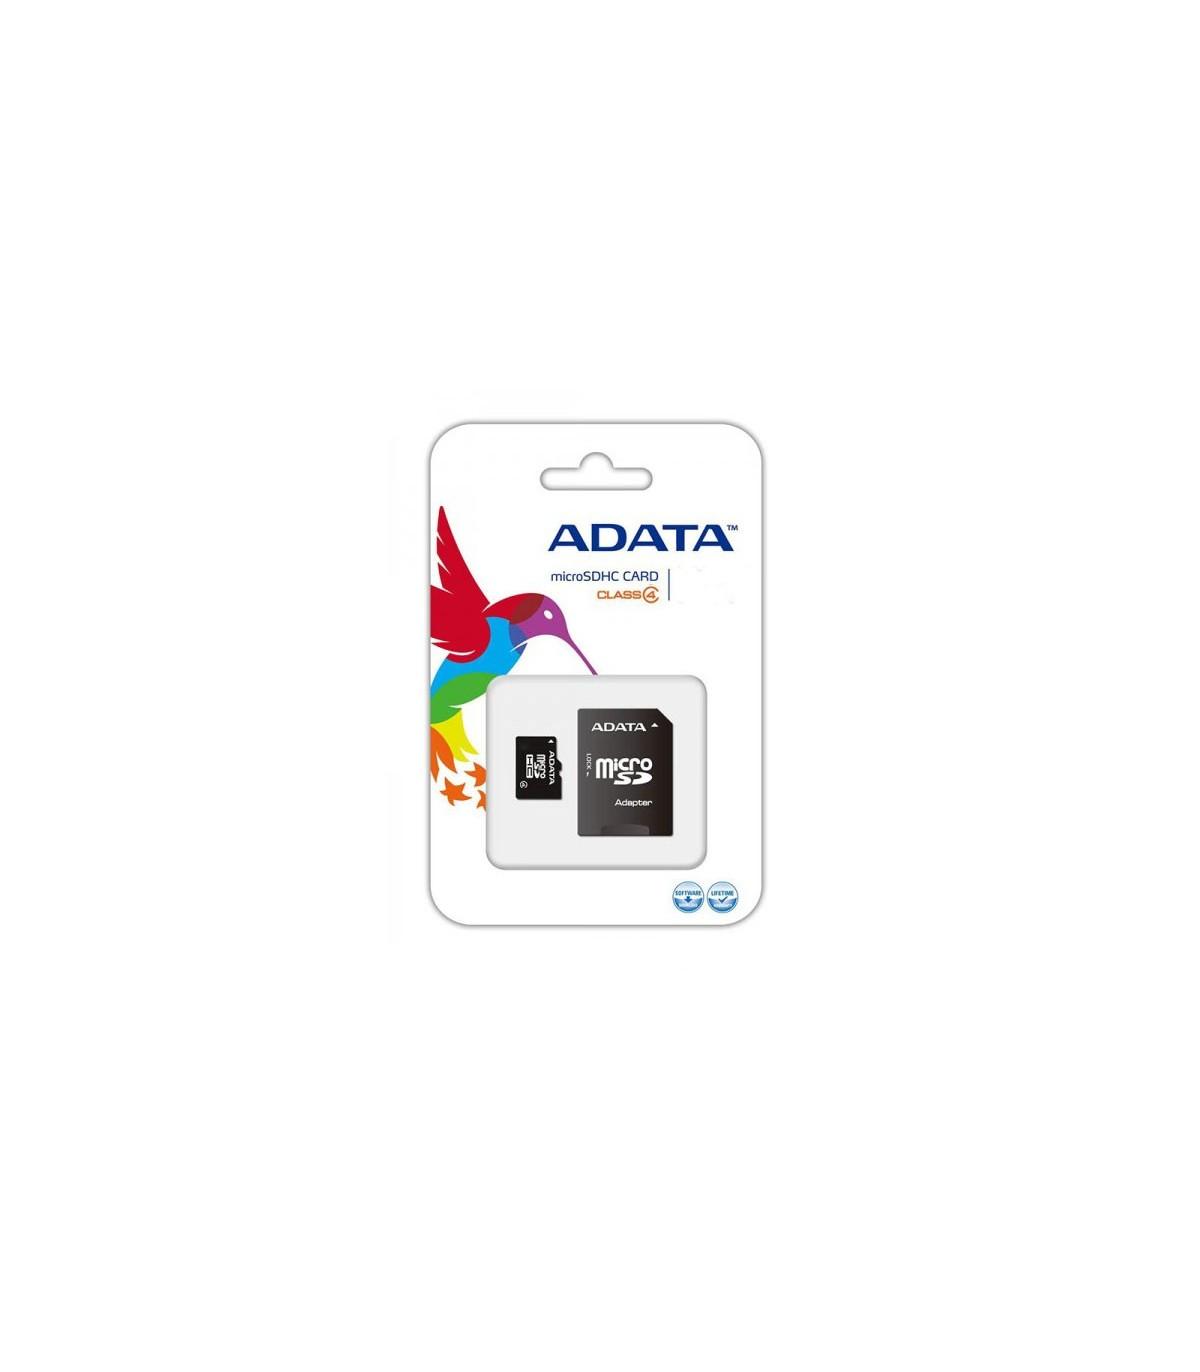 رم میکرو اس دی Adata microSDHC Card Class 4 16GB